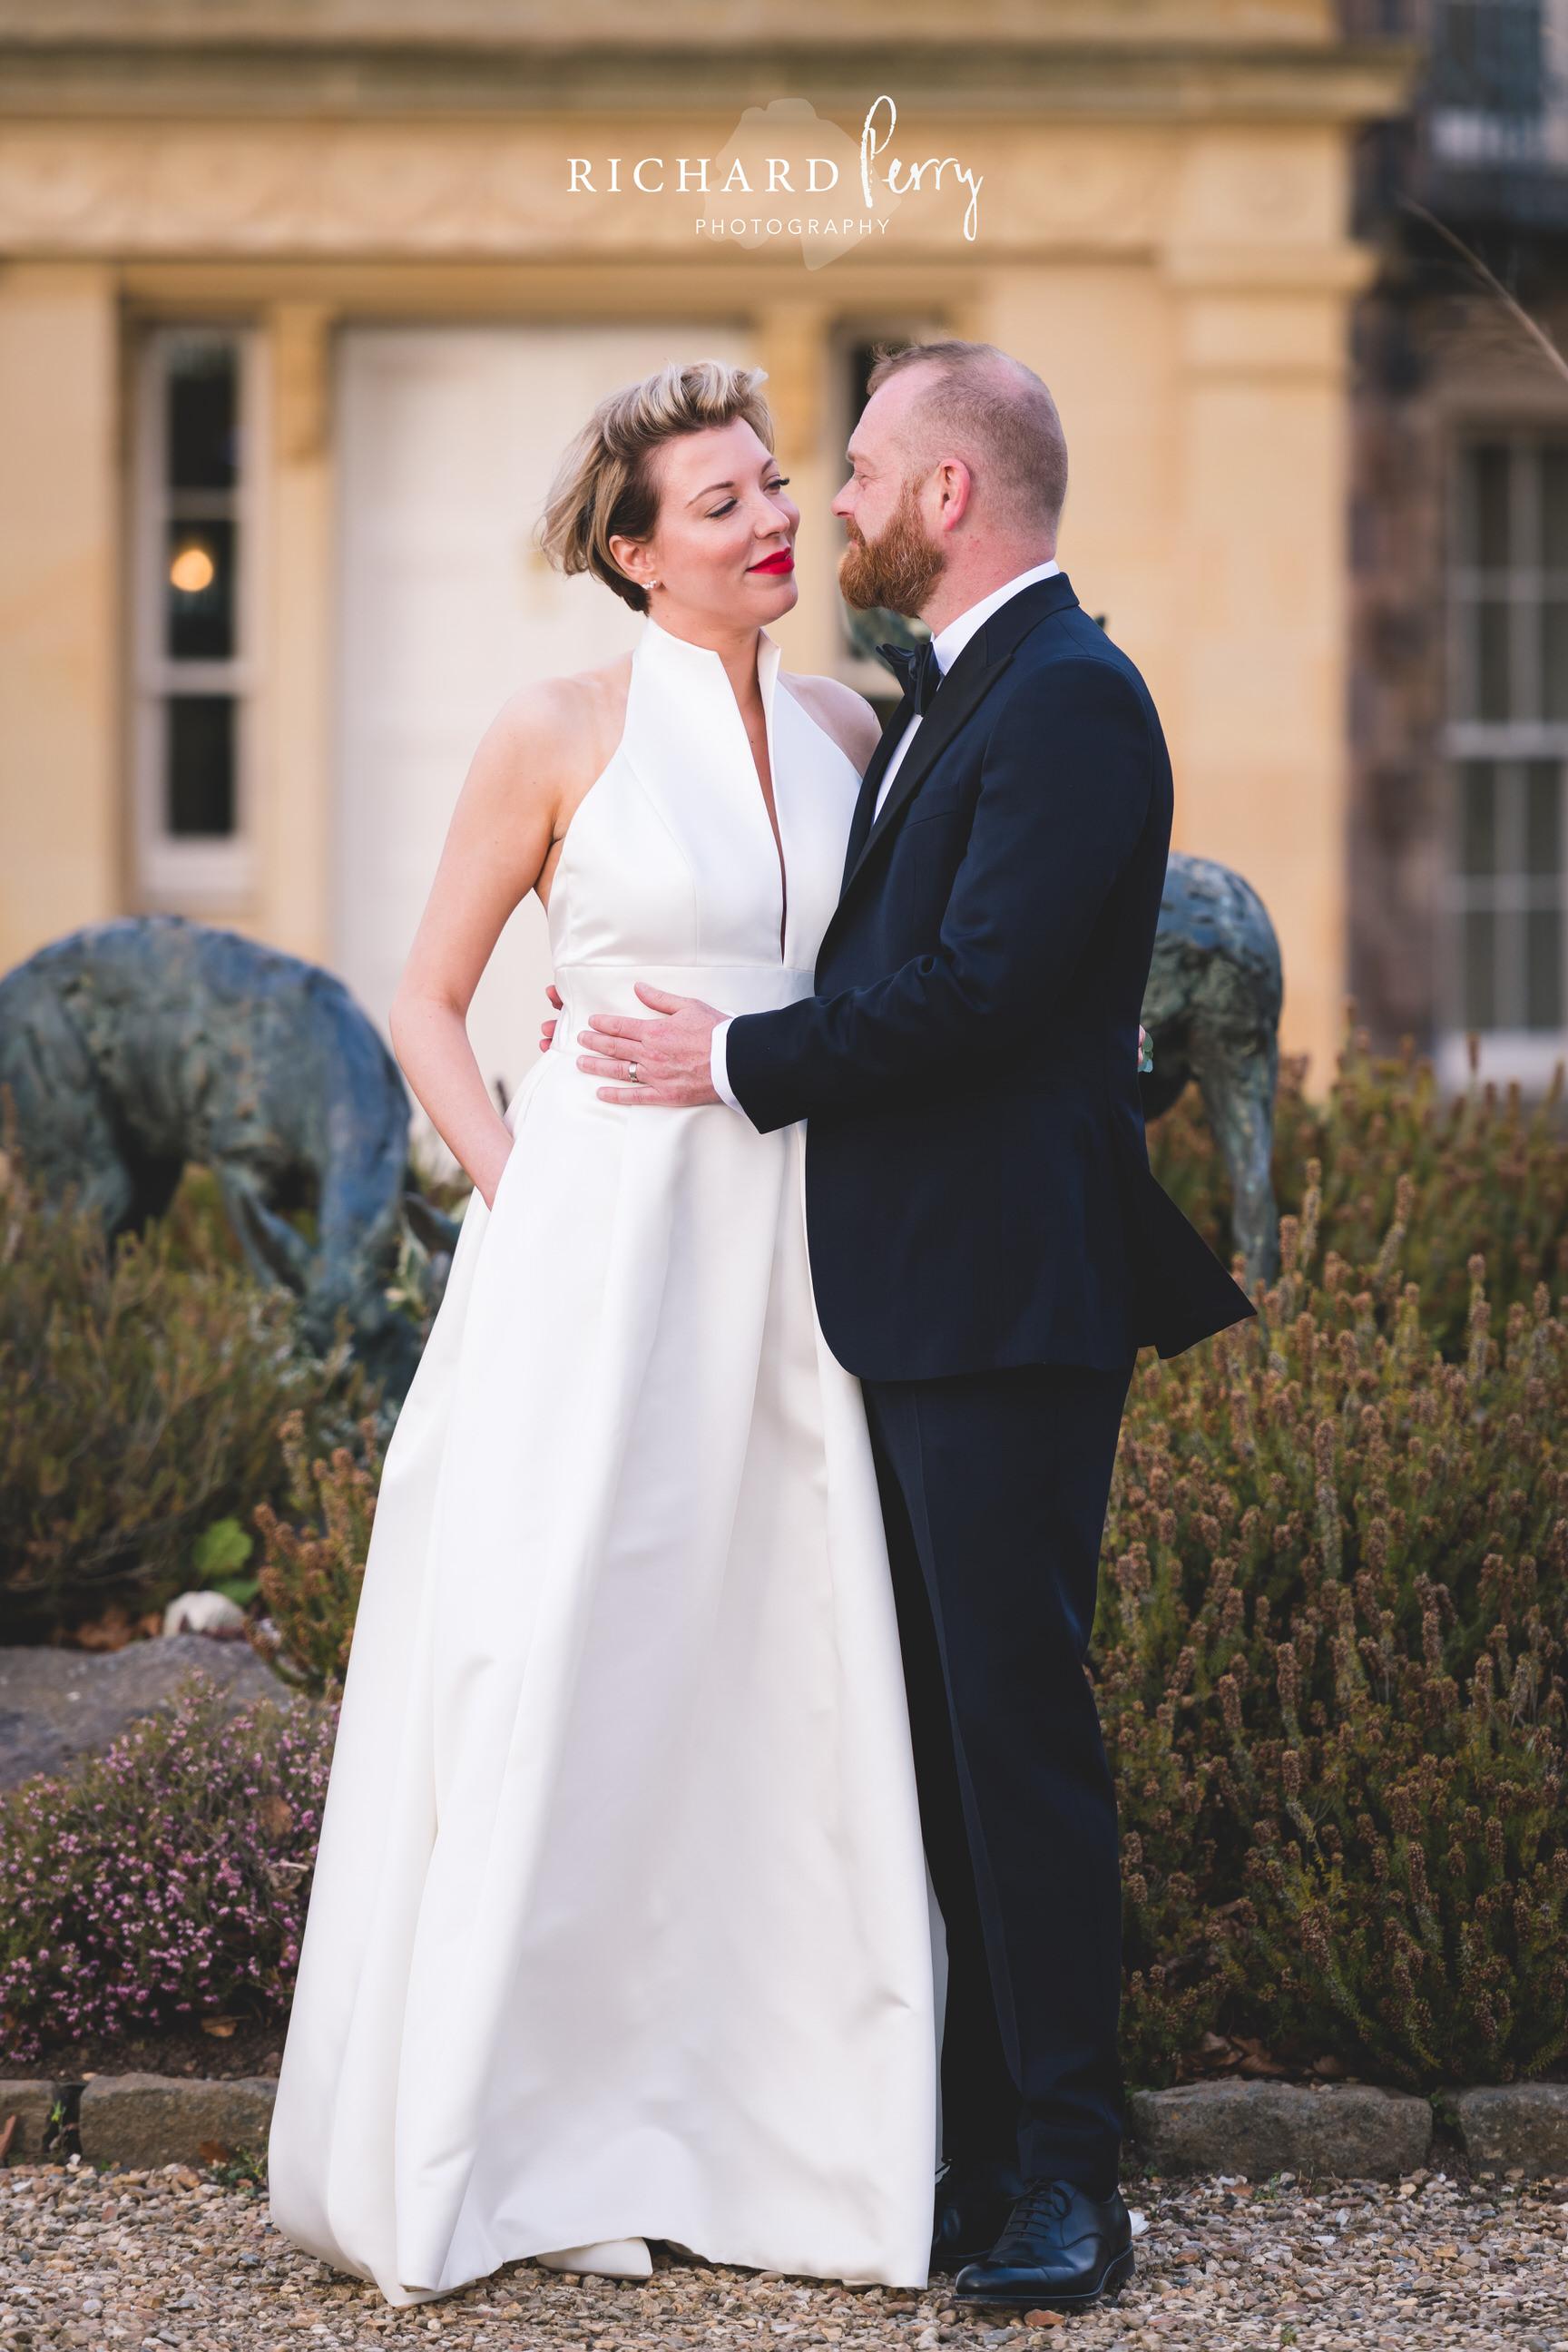 yorkshire-wedding-photographer-destination-archerfield-house-22.jpg